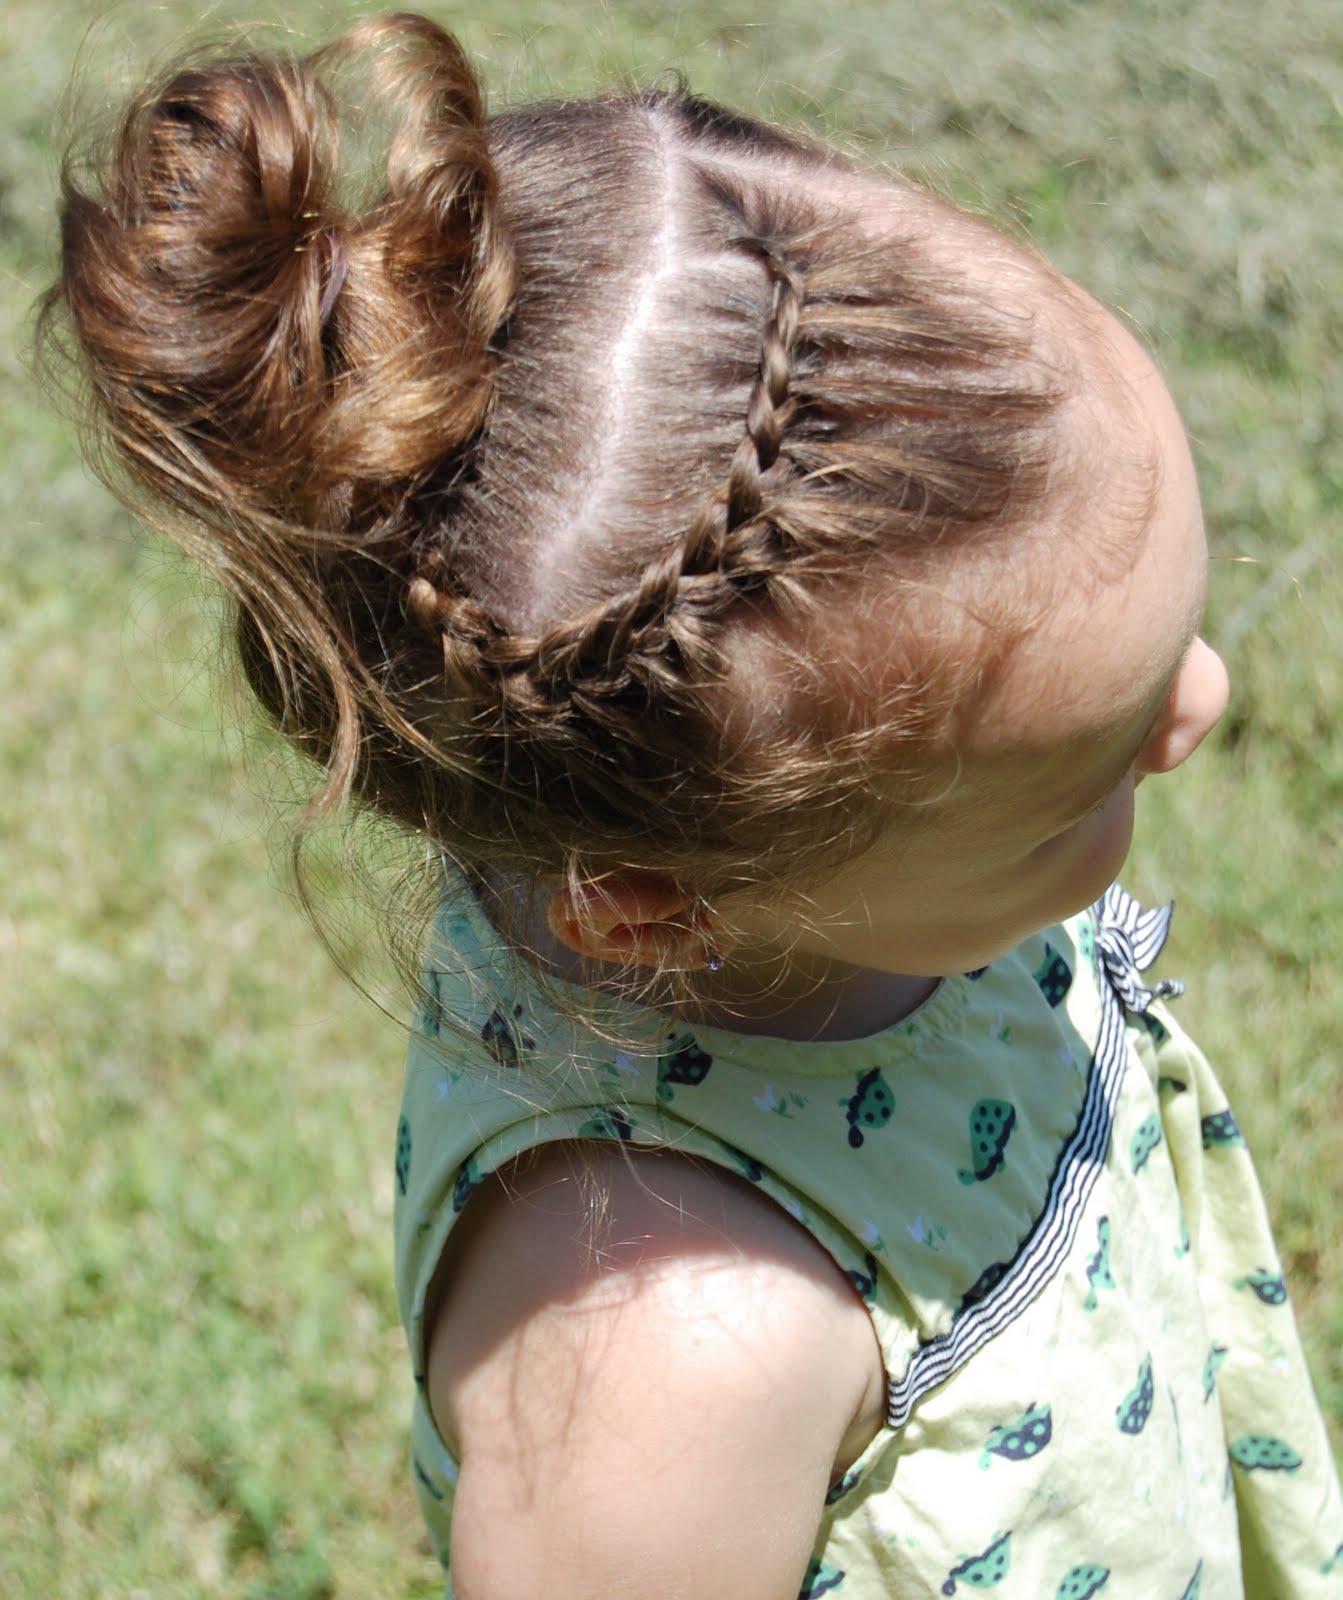 Sensational Hair For The Mini Diva Gymnast Bun Lauren39S From Make It Or Break It Hairstyles For Women Draintrainus